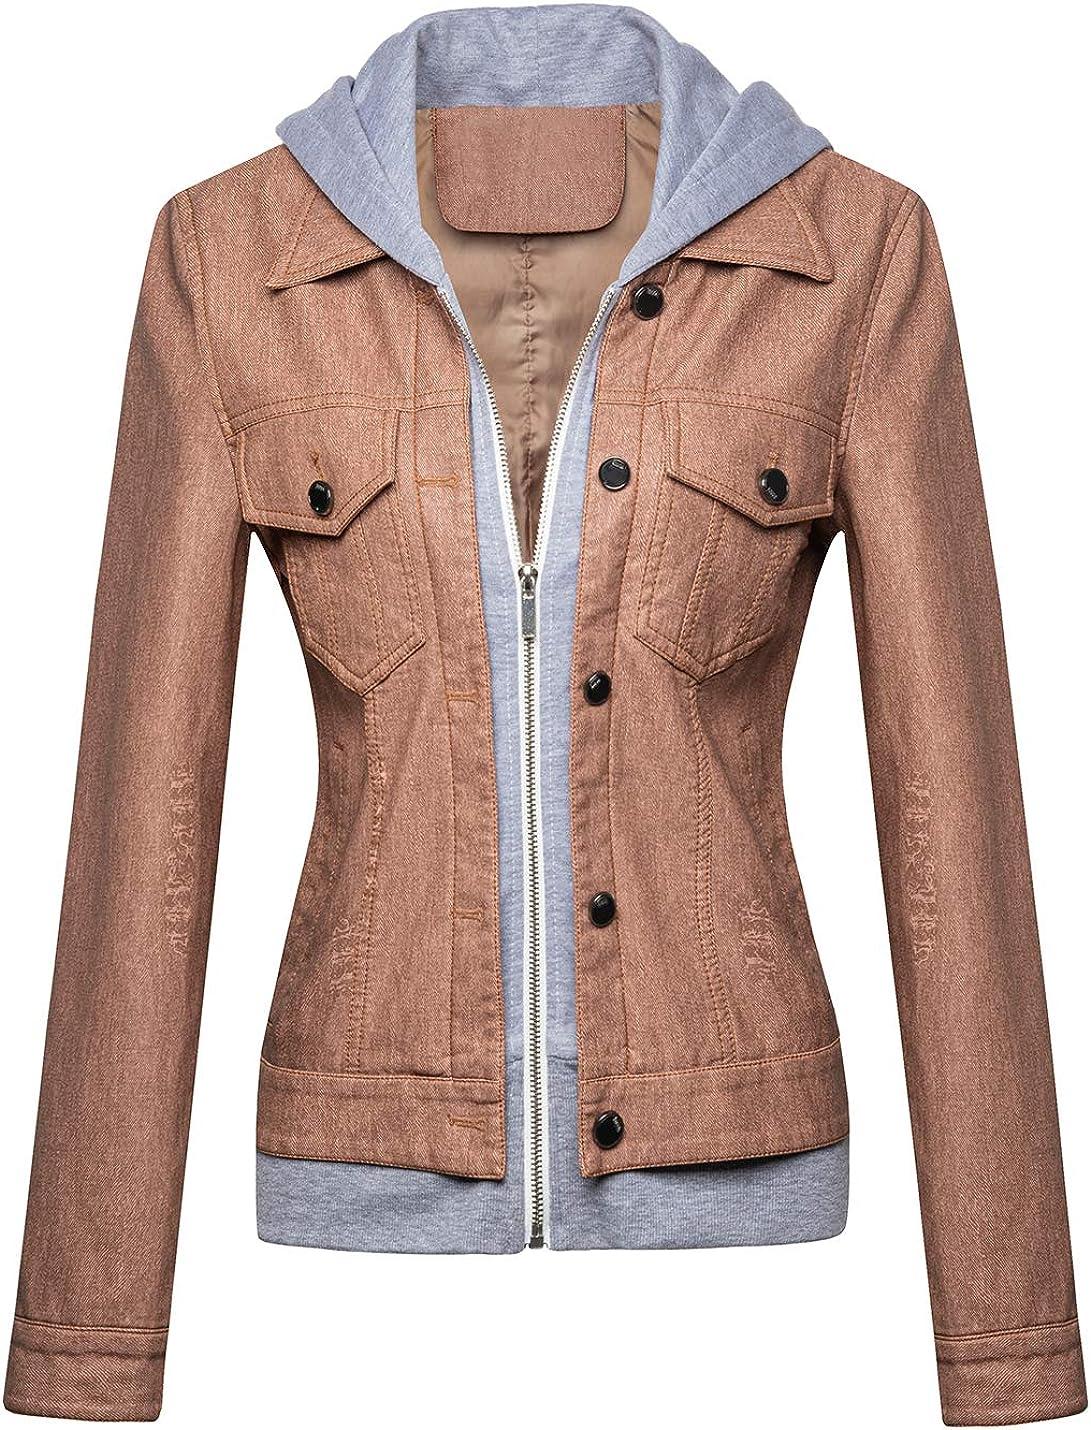 Tanming Women's Slim Denim Look Faux PU Leather Hooded Short Trucker Jacket Coats